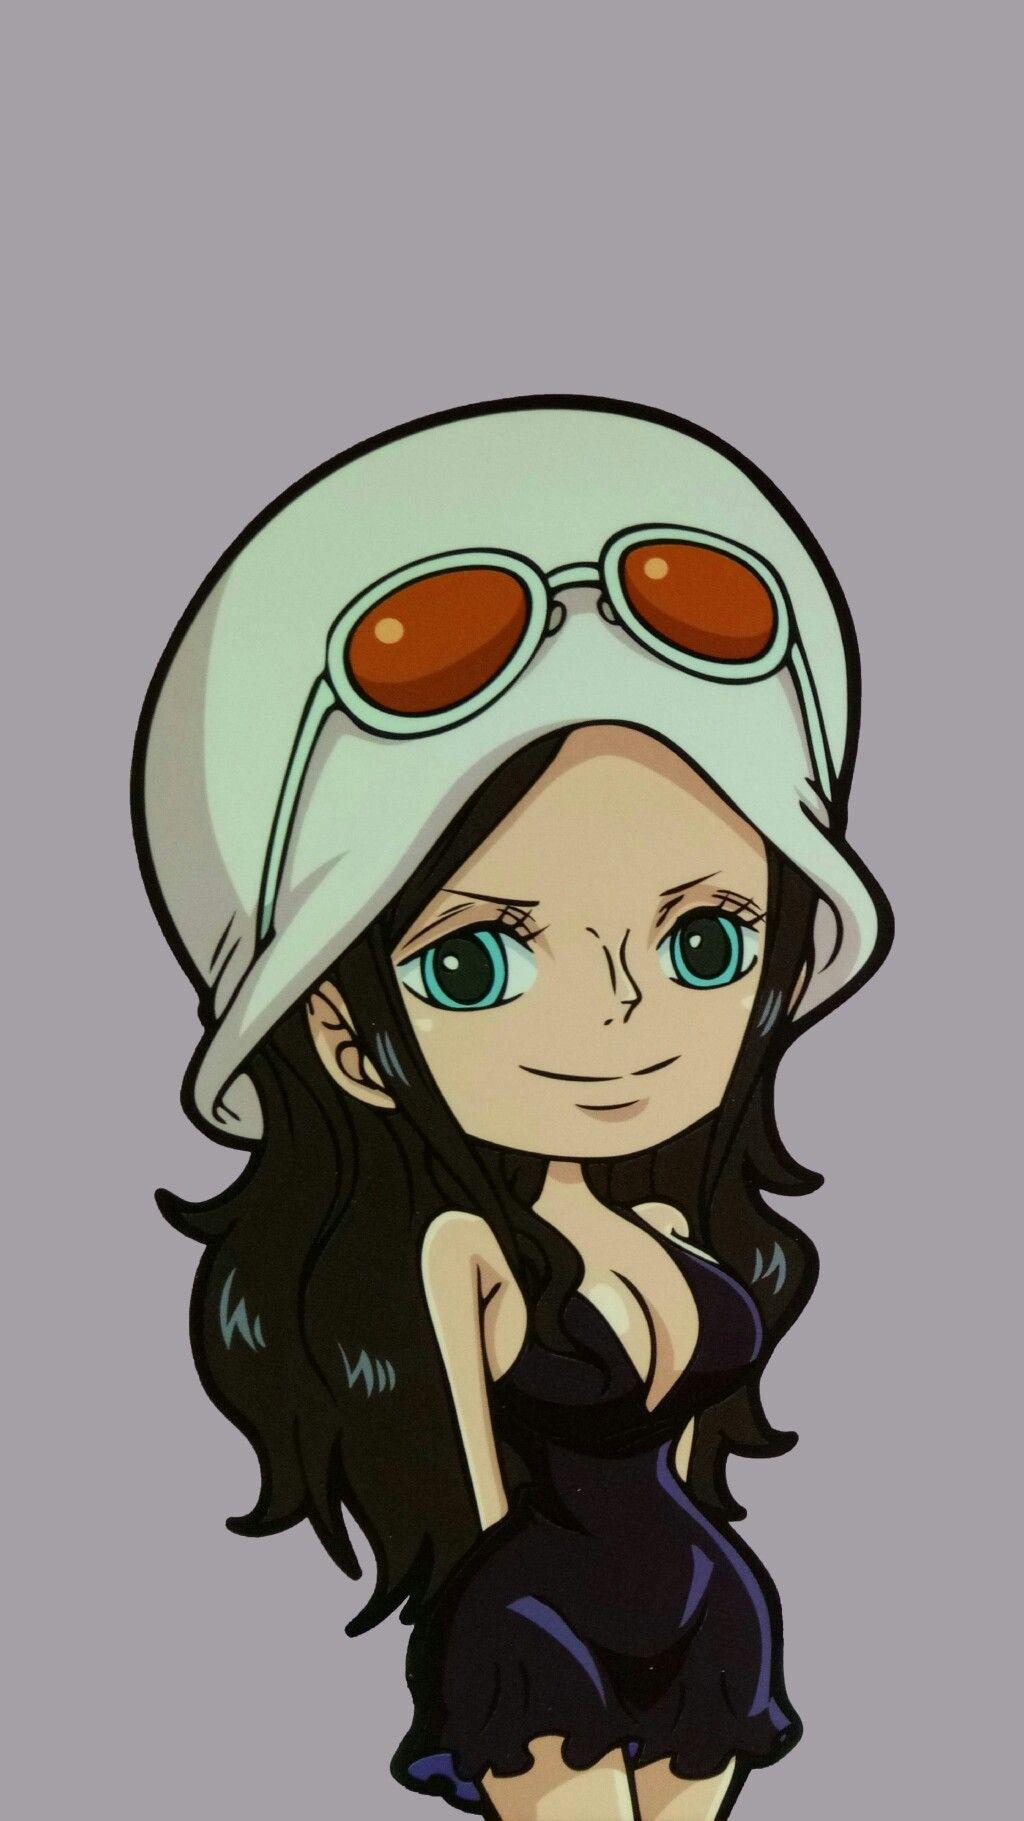 Nico Robin Anime Echii, Anime Japan, Anime One, Anime Comics, Chibi Wallpaper